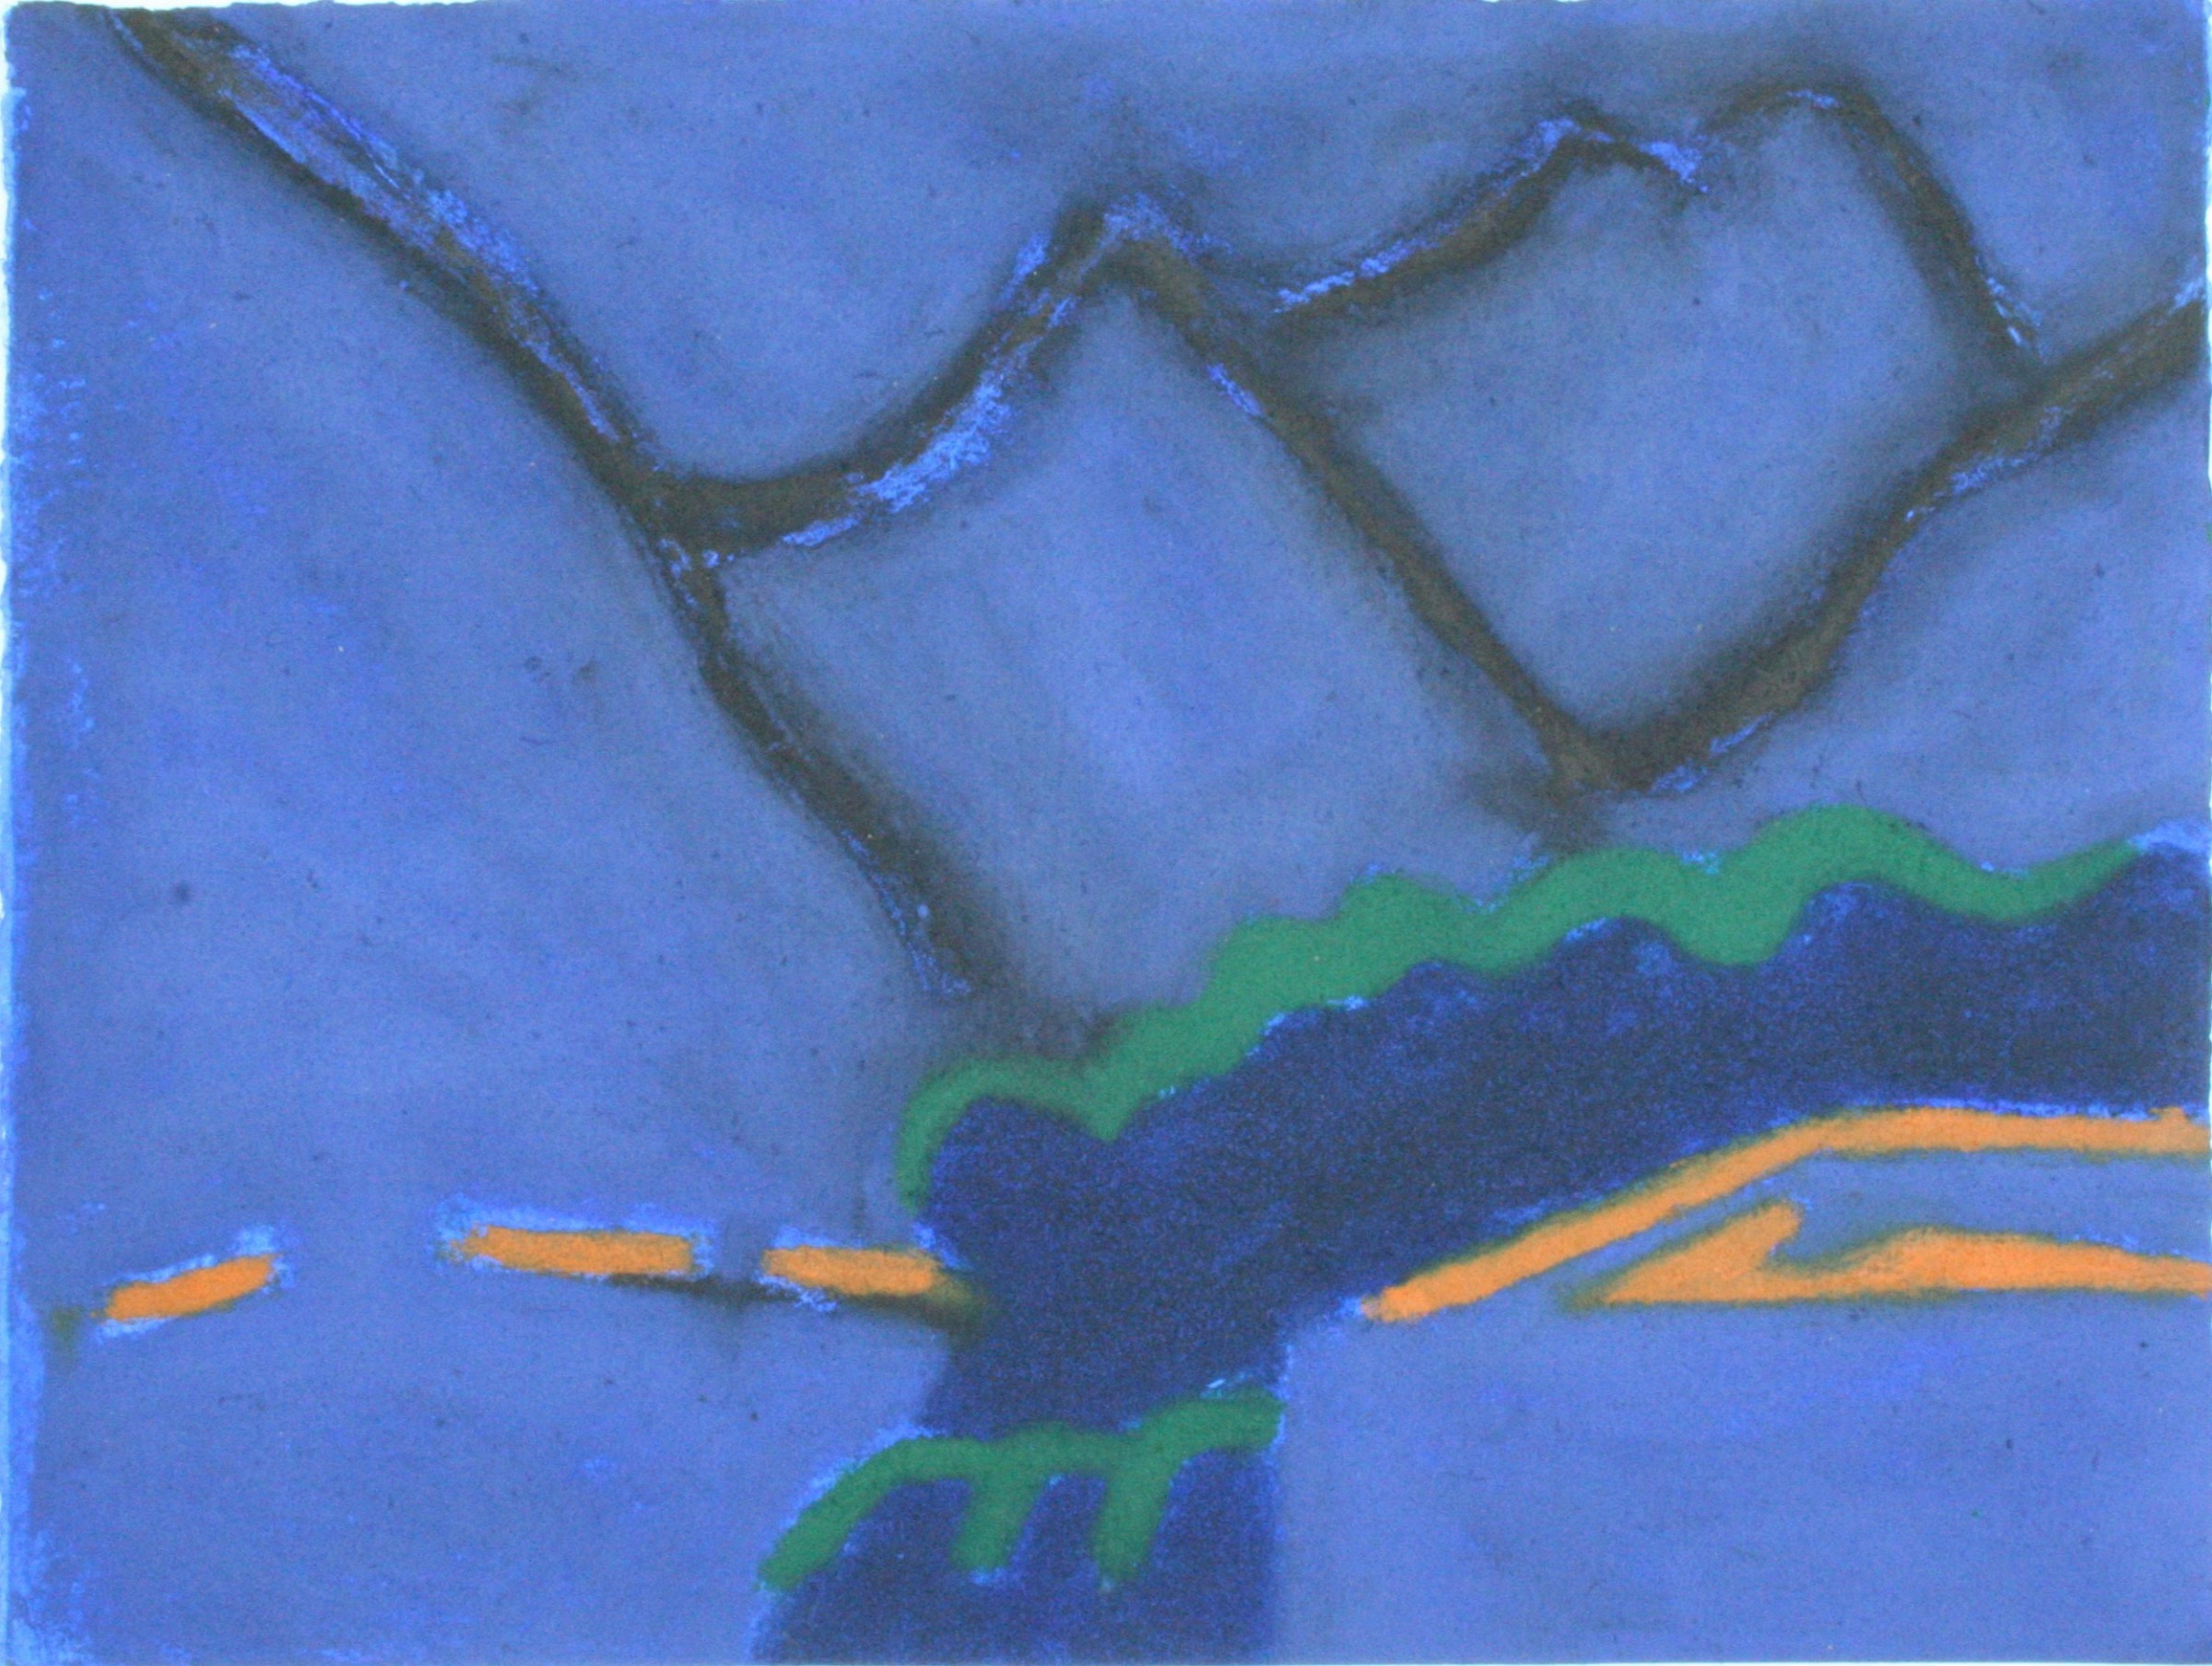 "<span class=""link fancybox-details-link""><a href=""/exhibitions/24/works/artworks_standalone11443/"">View Detail Page</a></span><div class=""artist""><span class=""artist""><strong>Ursula Leach RE</strong></span></div><div class=""title""><em>Night Mountains</em></div><div class=""medium"">carborundum and hand colouring</div><div class=""dimensions"">39 x 49 cm framed<br>31 x 41 cm image size</div><div class=""edition_details"">edition of 7</div>"